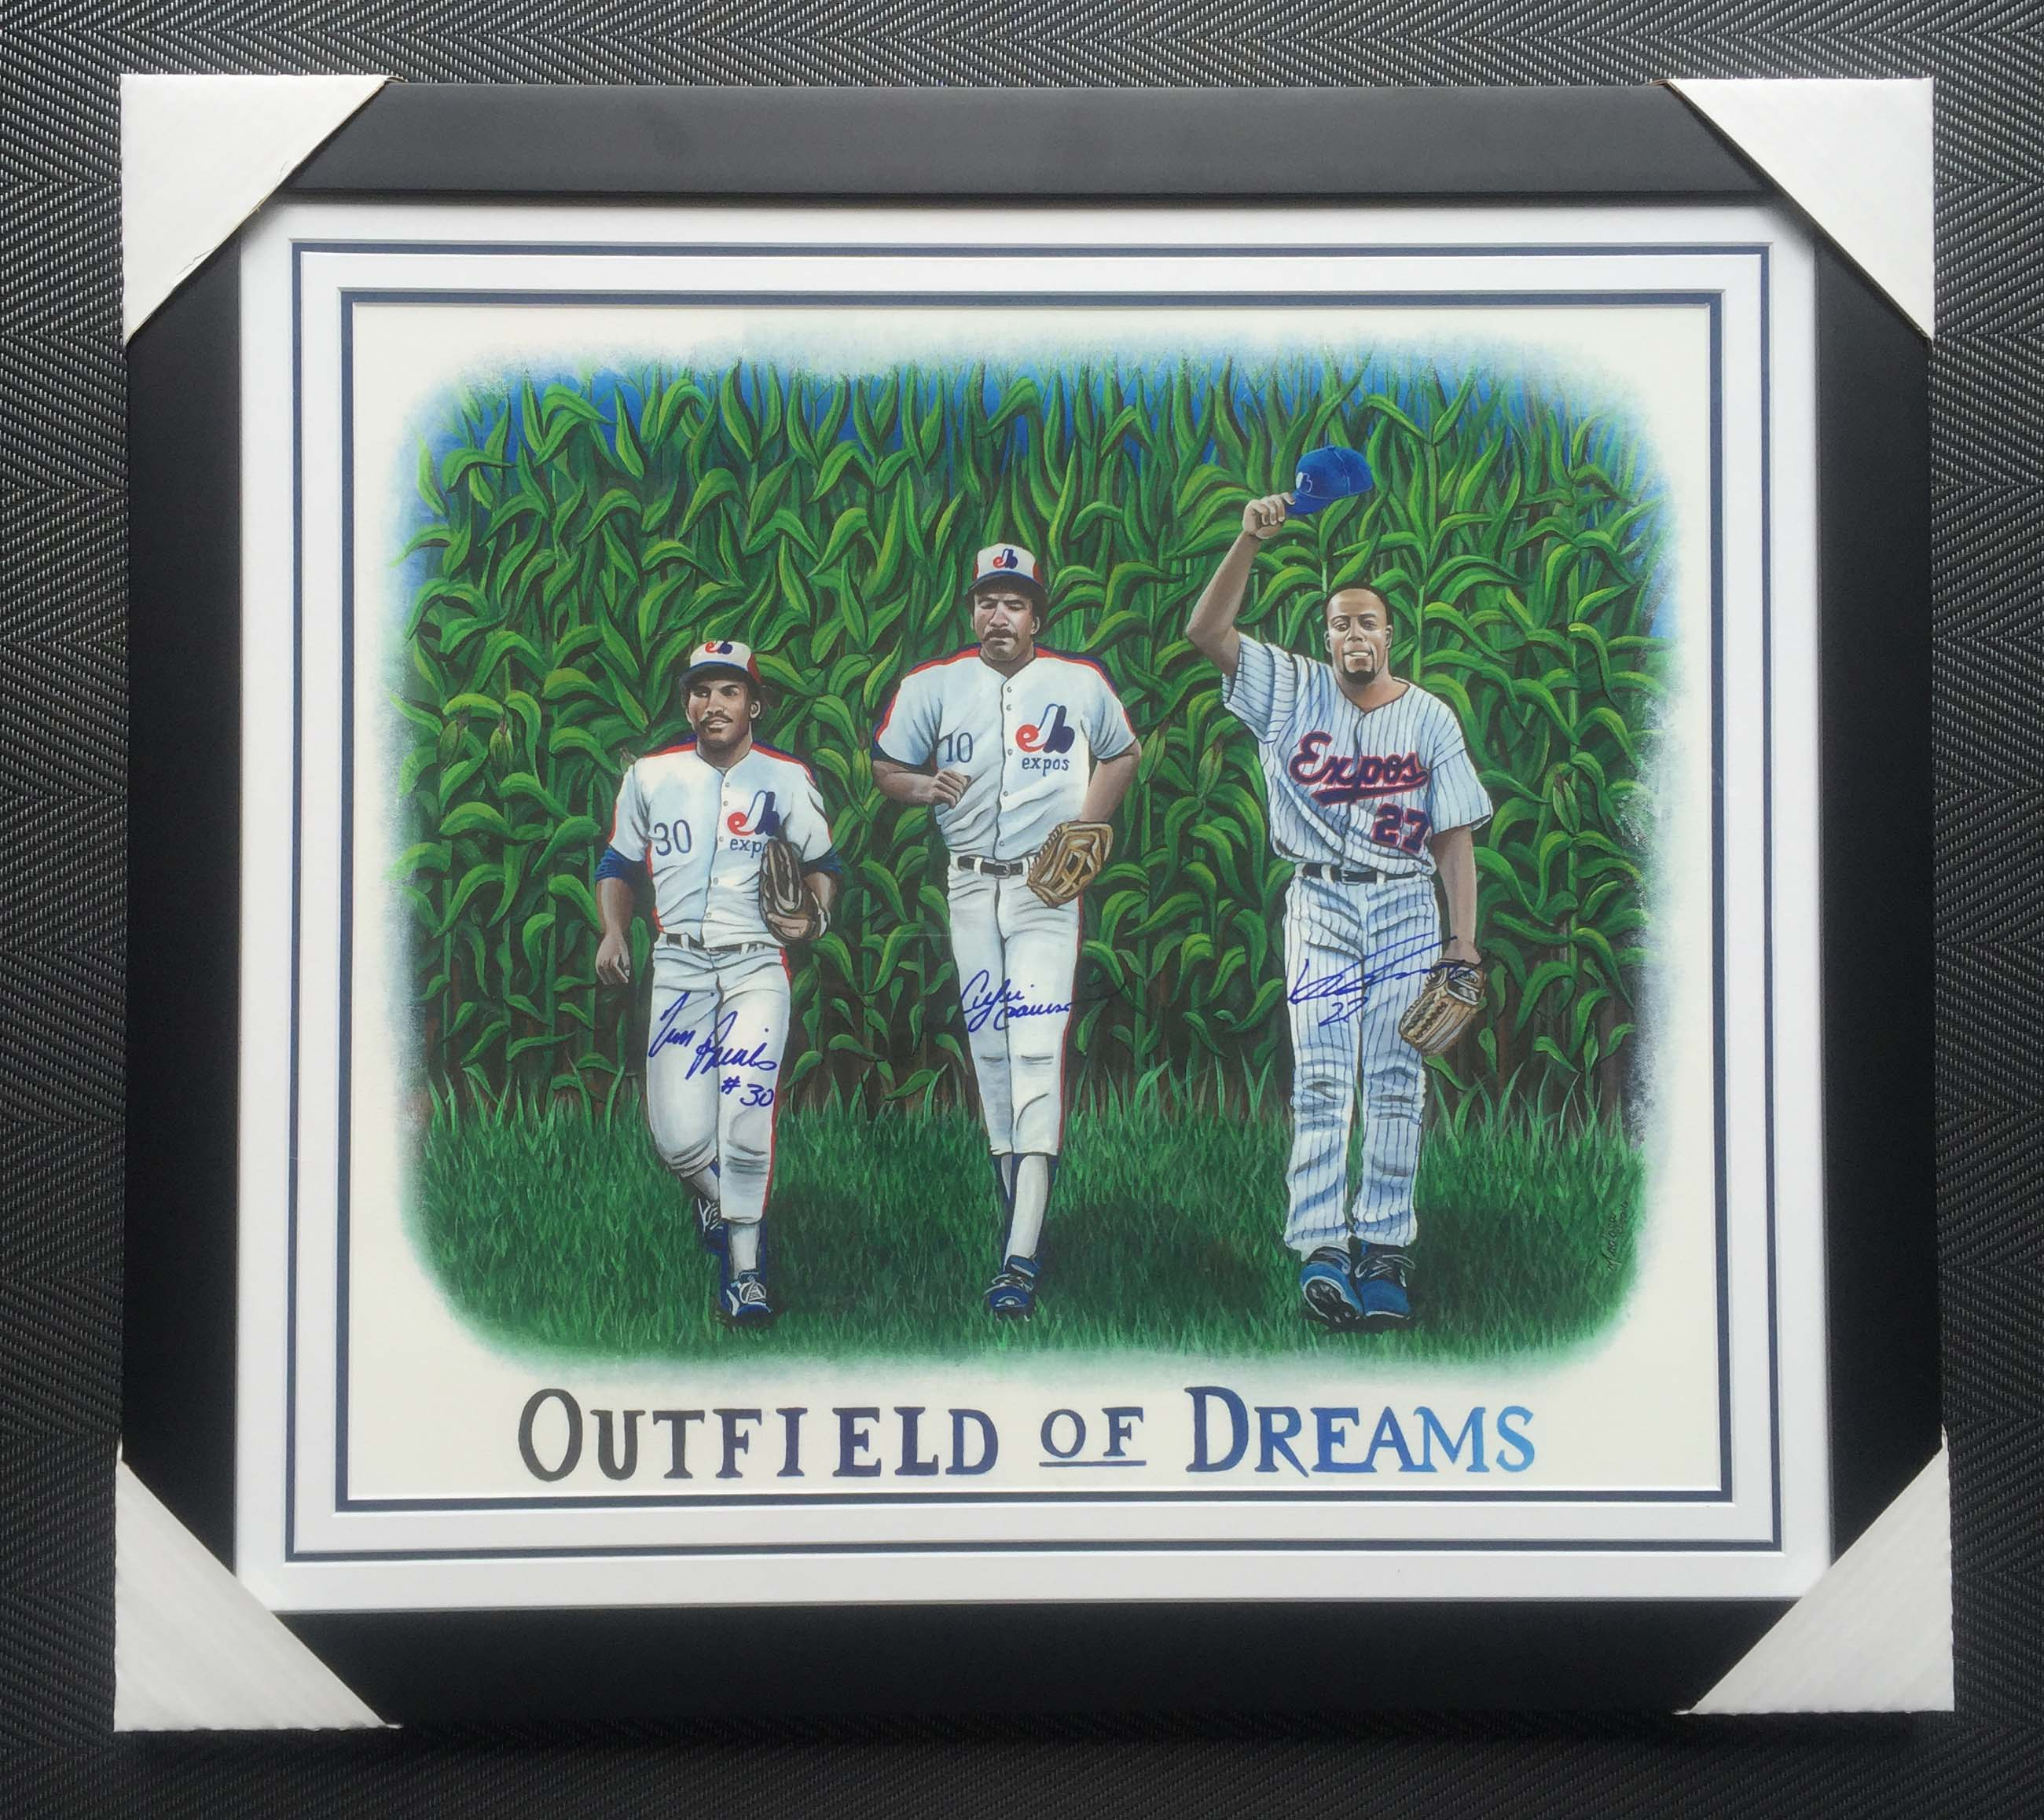 Cadre 30×26 Outfield of Dreams Signé par Tim Raines, Andre Dawson & Vladimir Guerrero